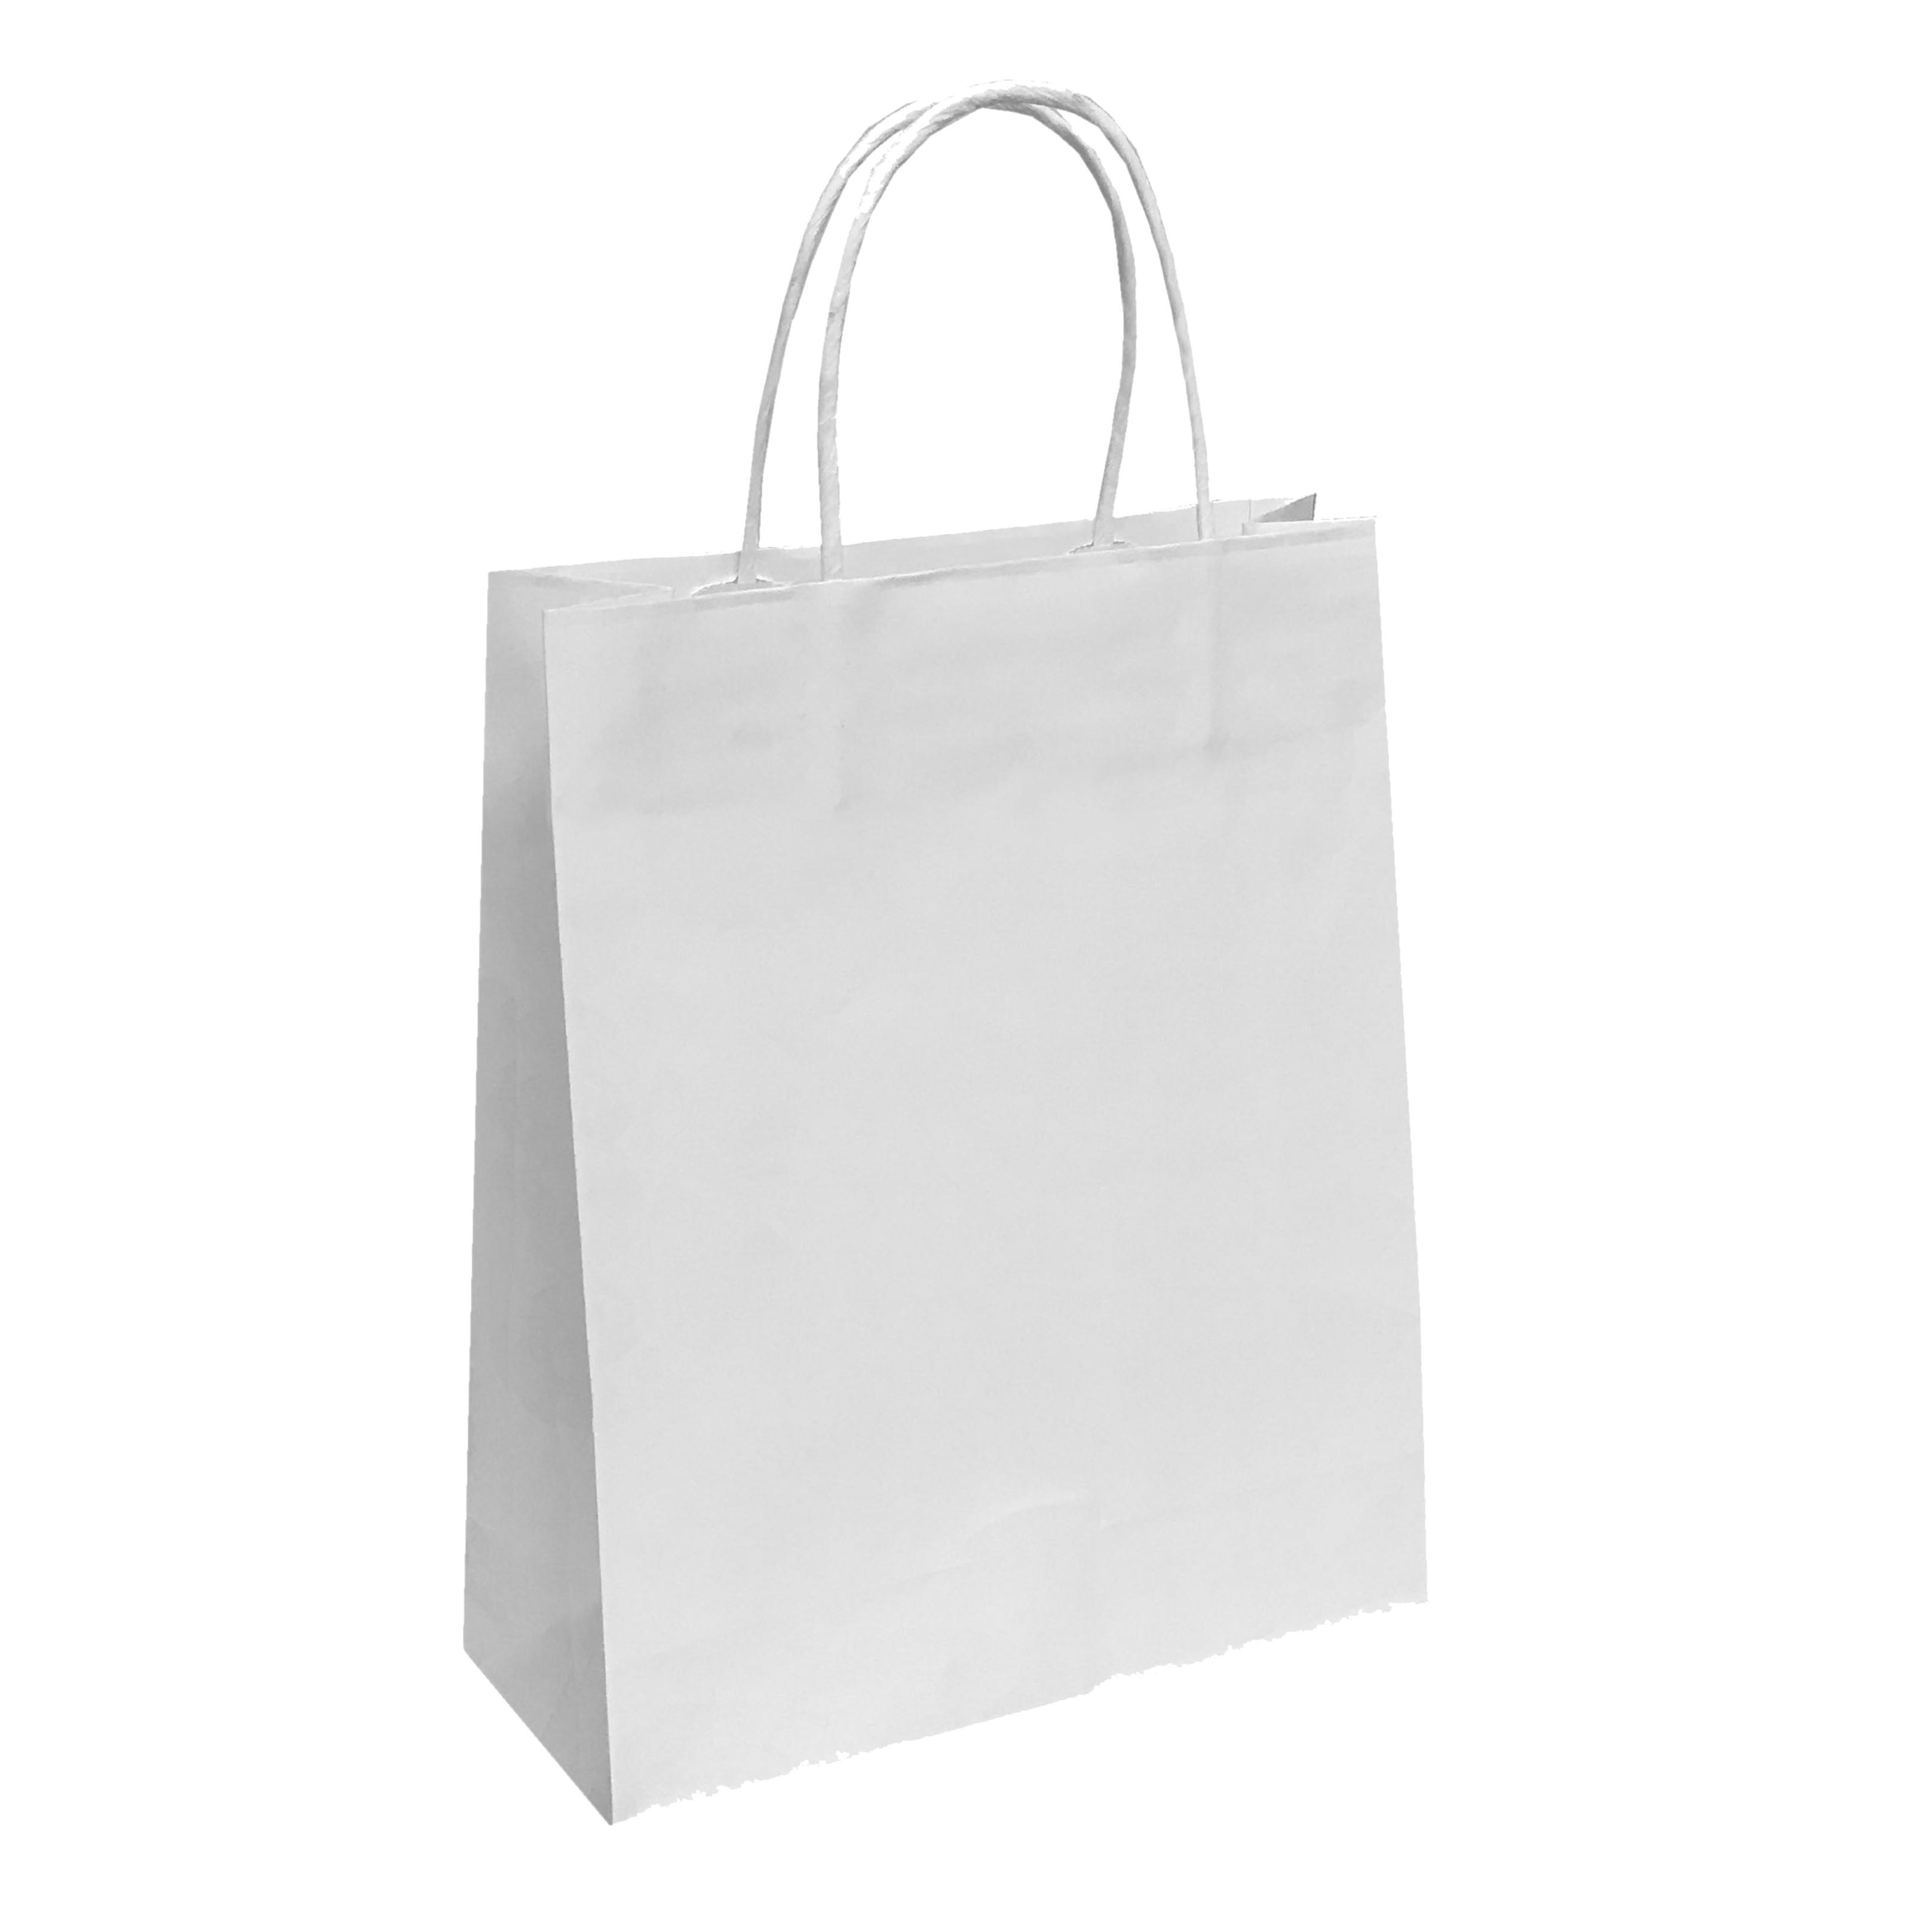 SALE: J-CUT FOLDING PAPER BAG